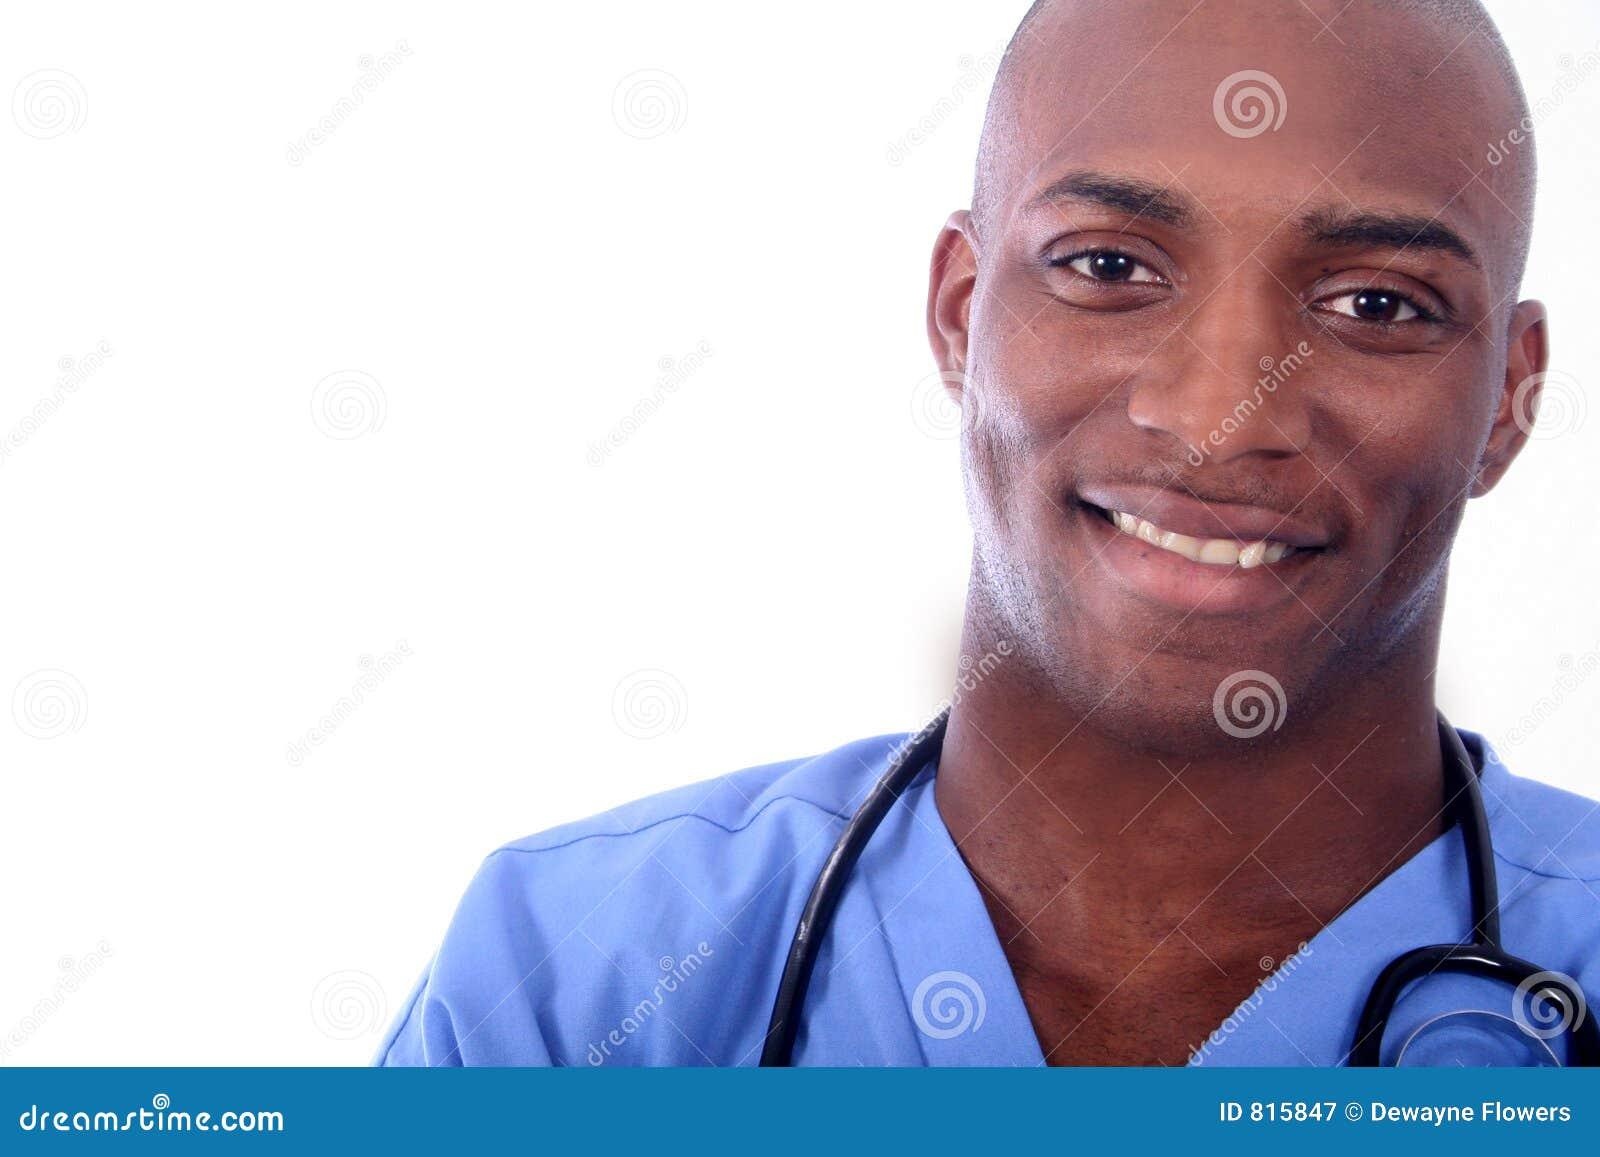 African Amrican Male Nurse